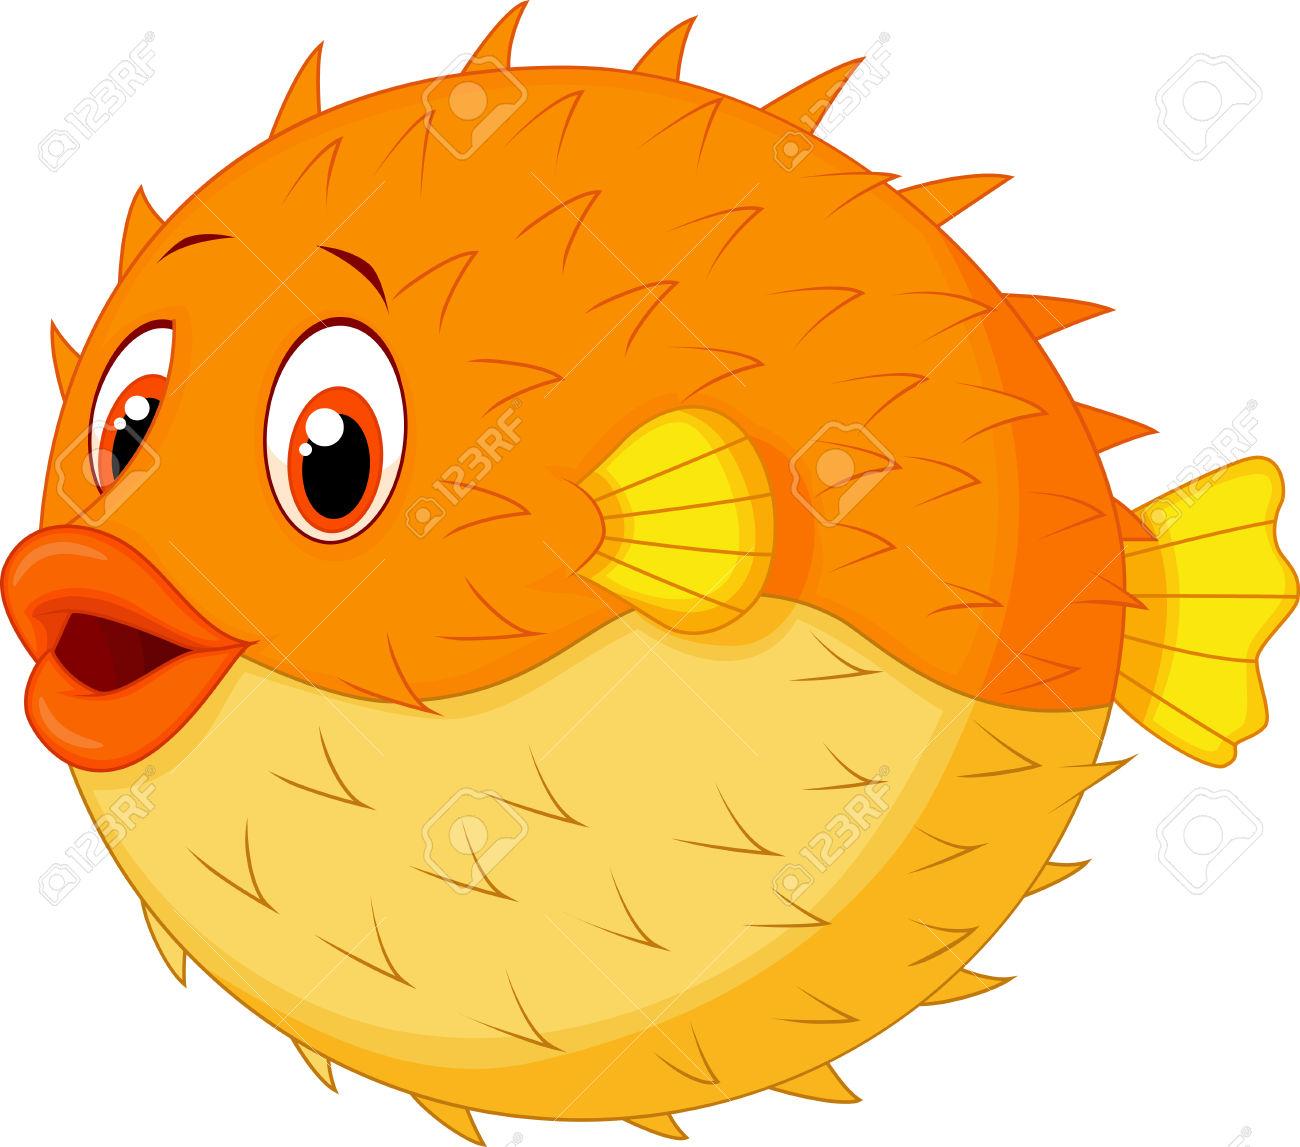 Blowfish clipart cute  Clipart Blowfish